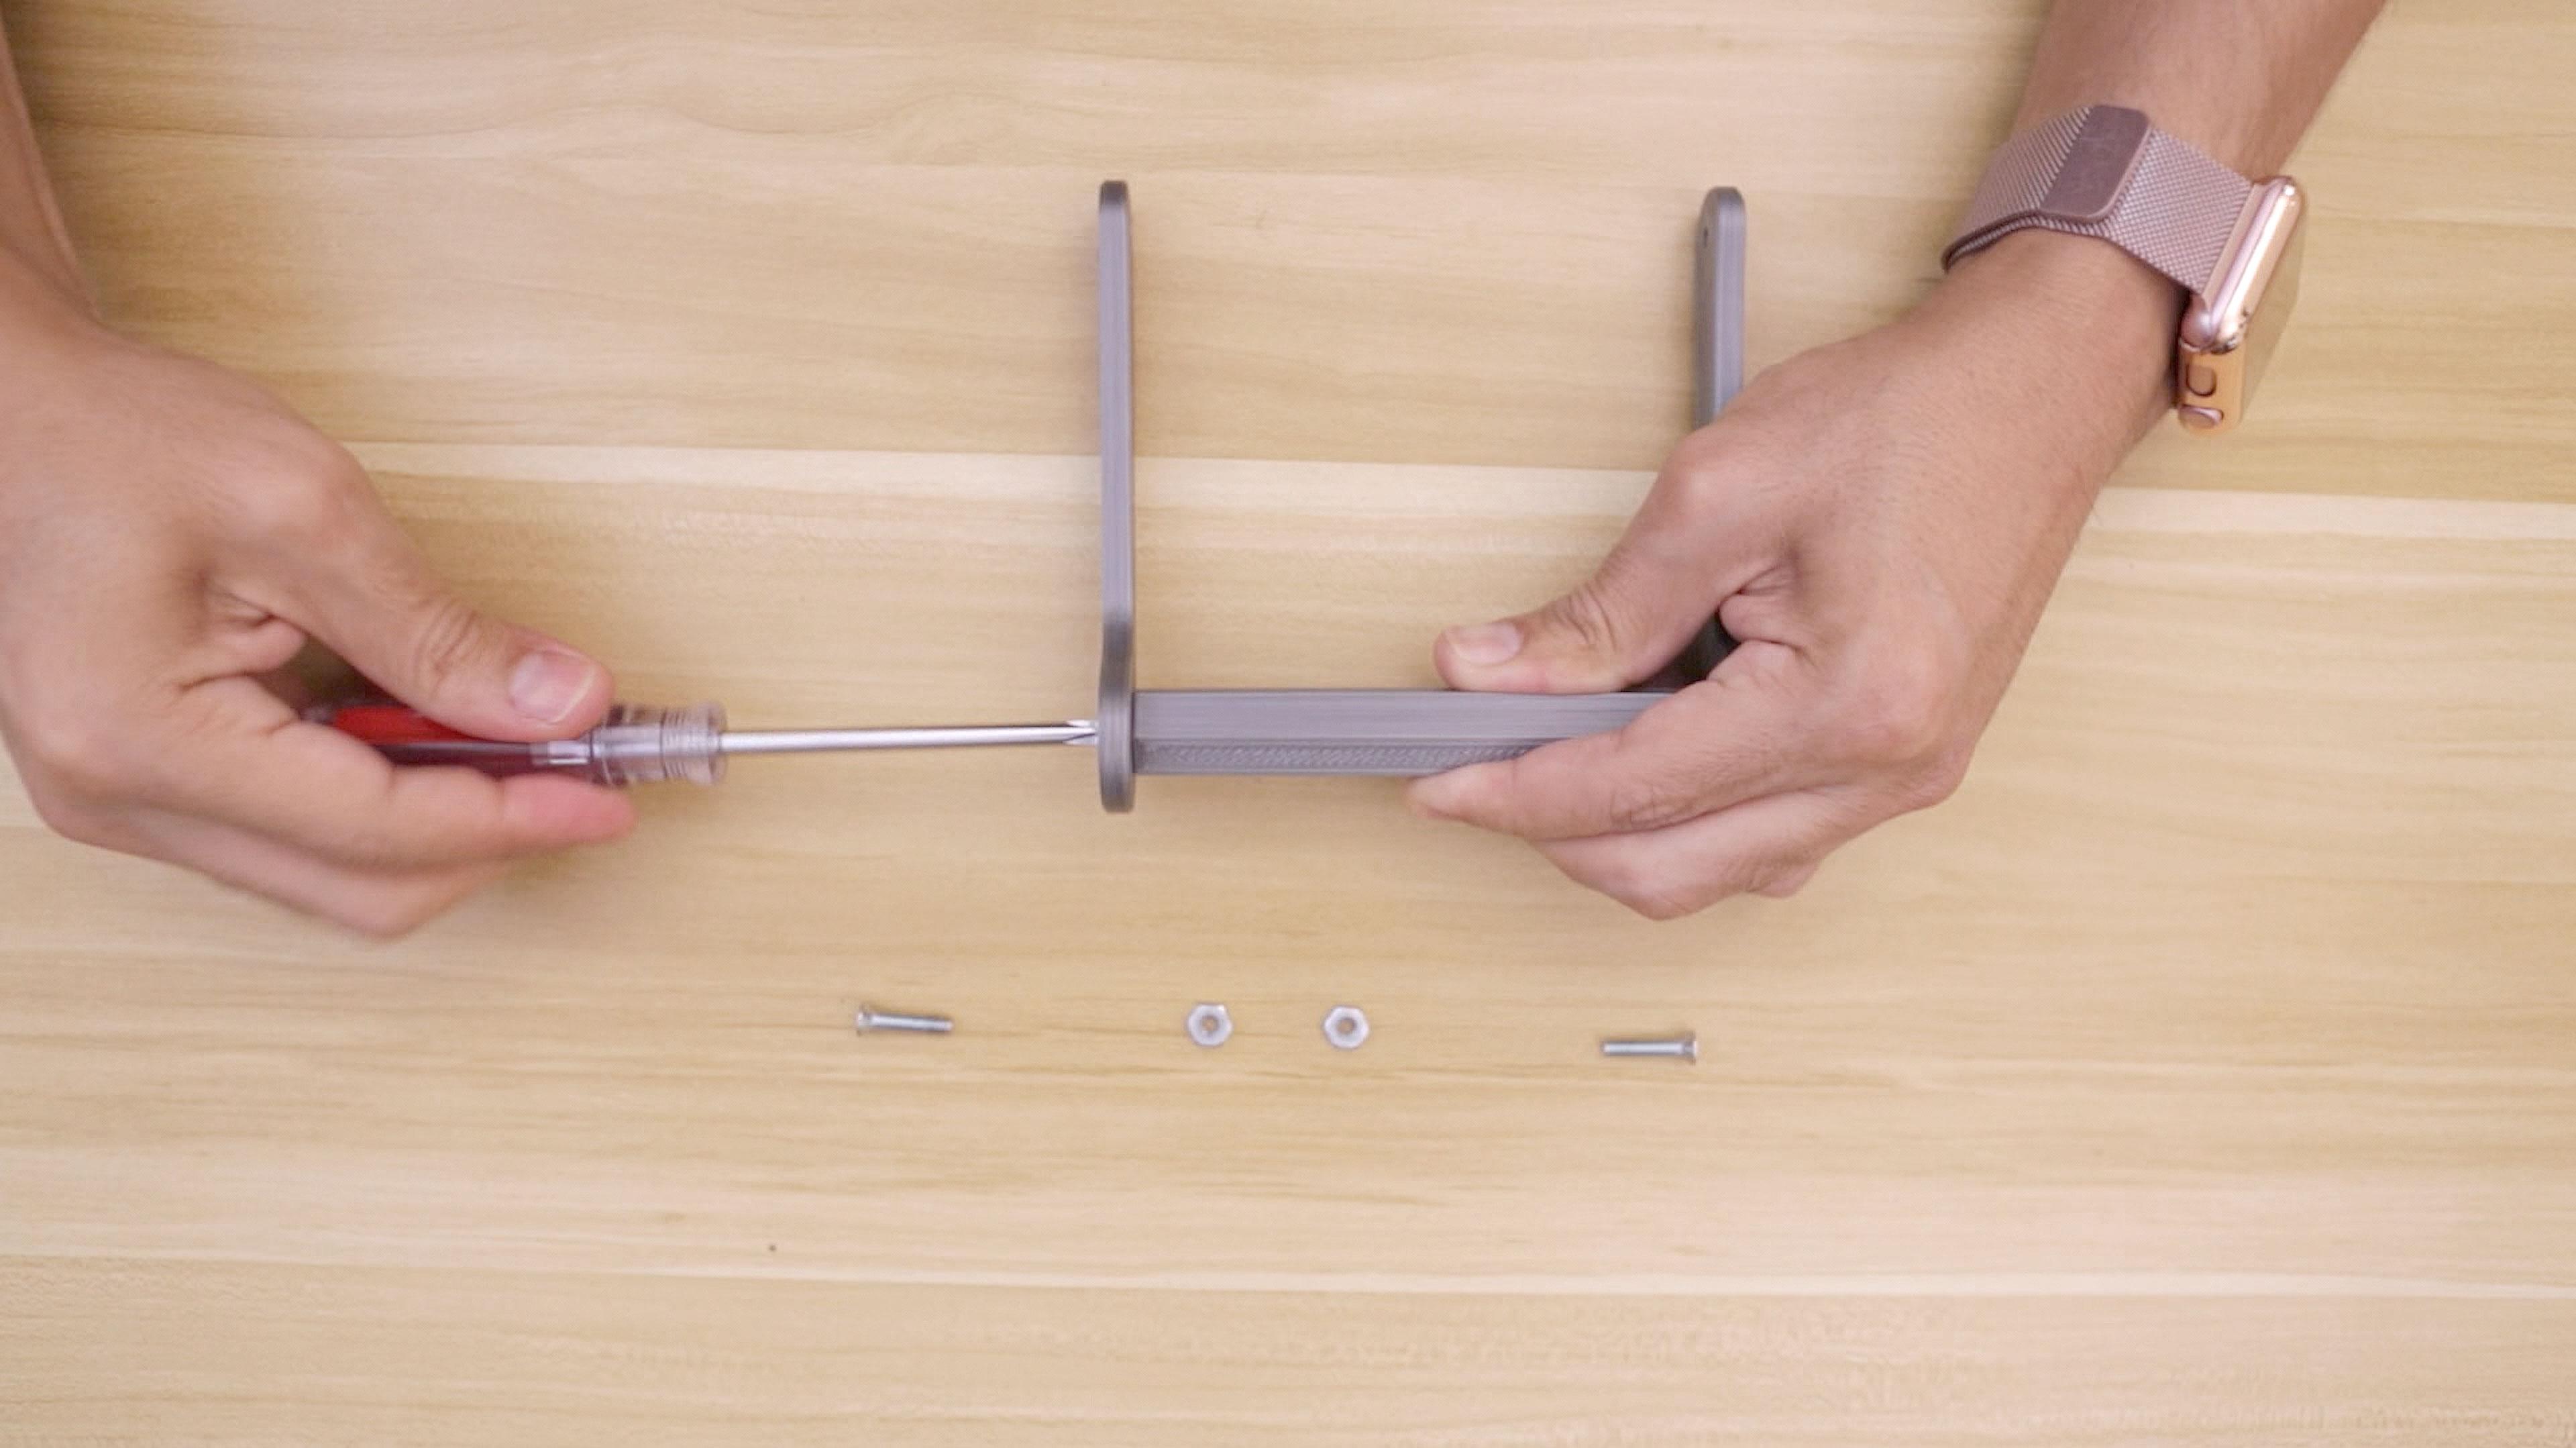 leds_handle-bar-assemble.jpg